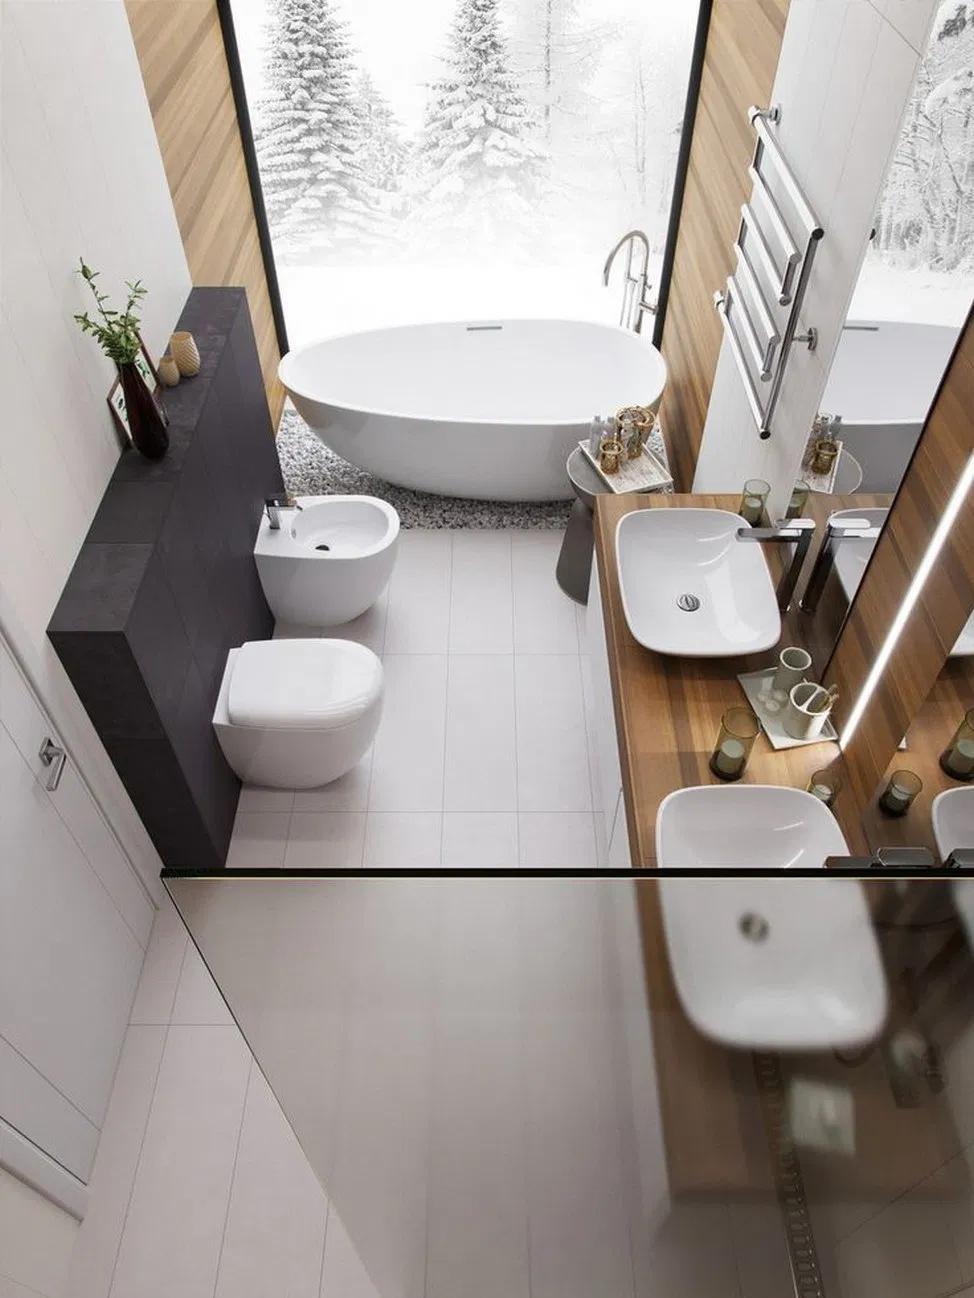 38 principles for creating the perfect bathroom 13   megasiana.com #bathroominte... - Jasmin's